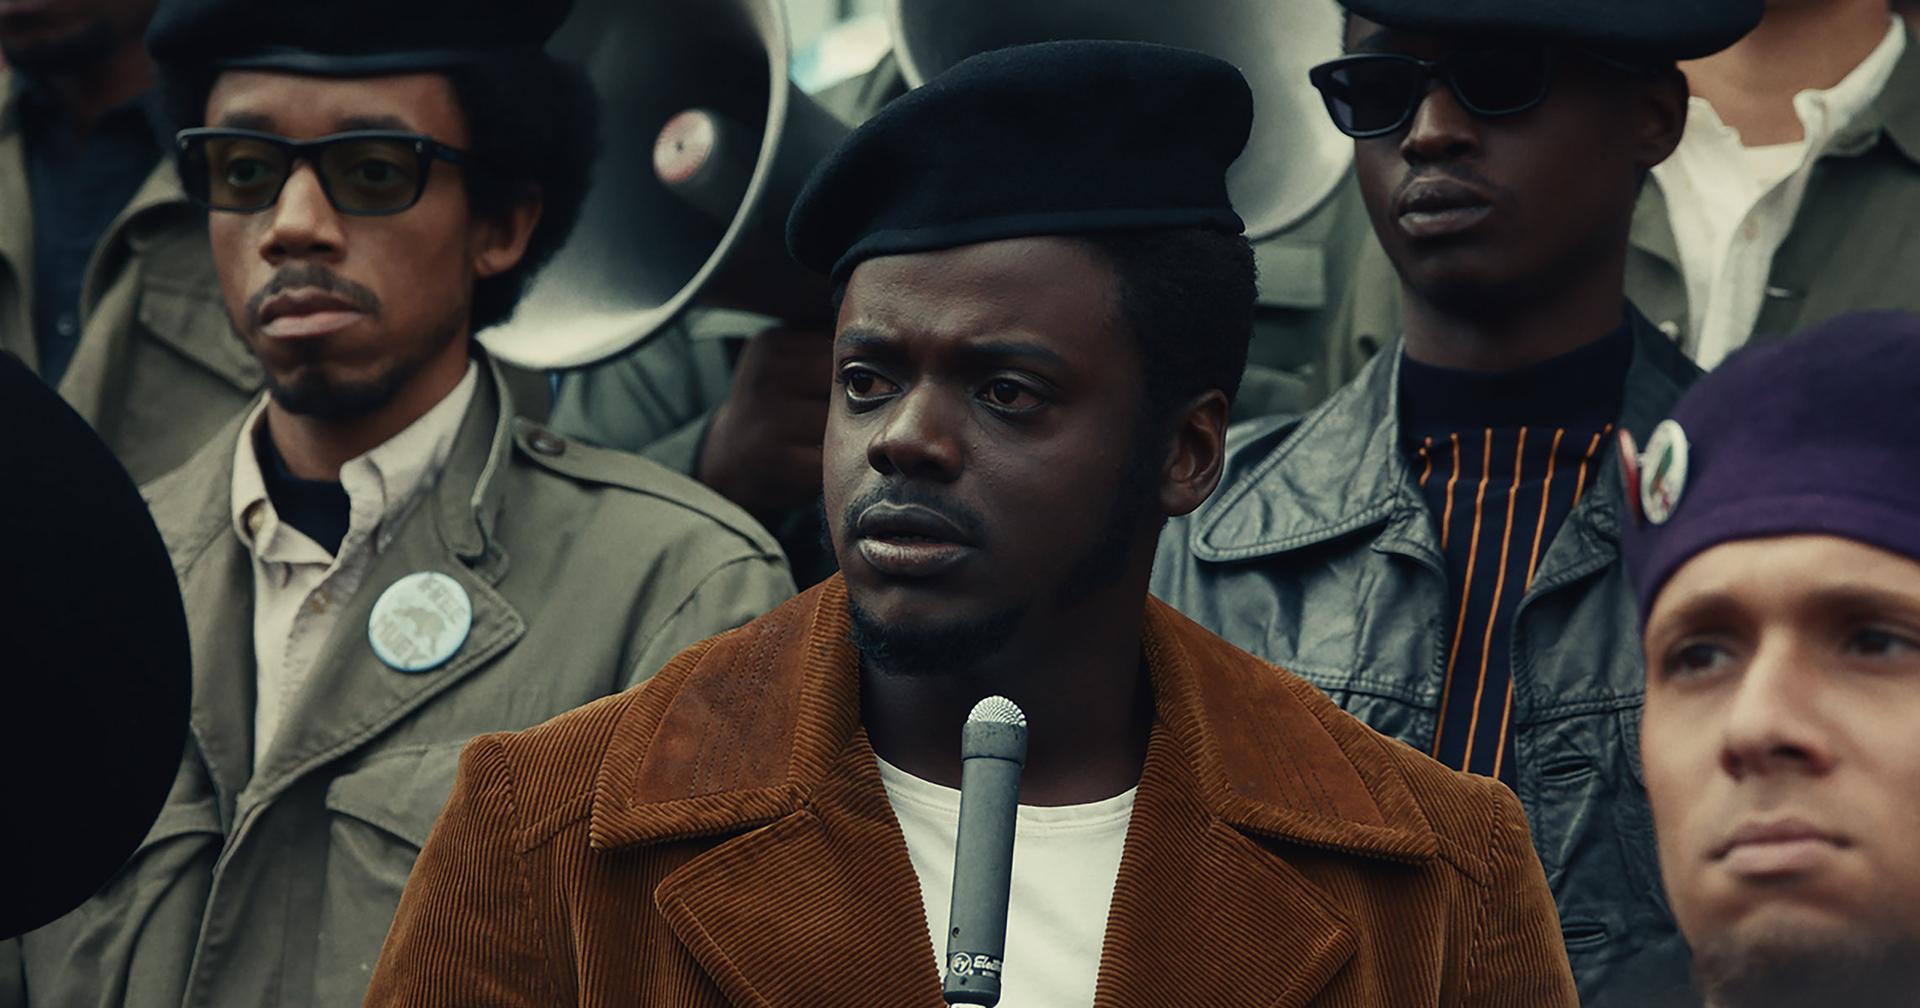 Daniel Kaluuya in a black beret in Judas and the Black Messiah